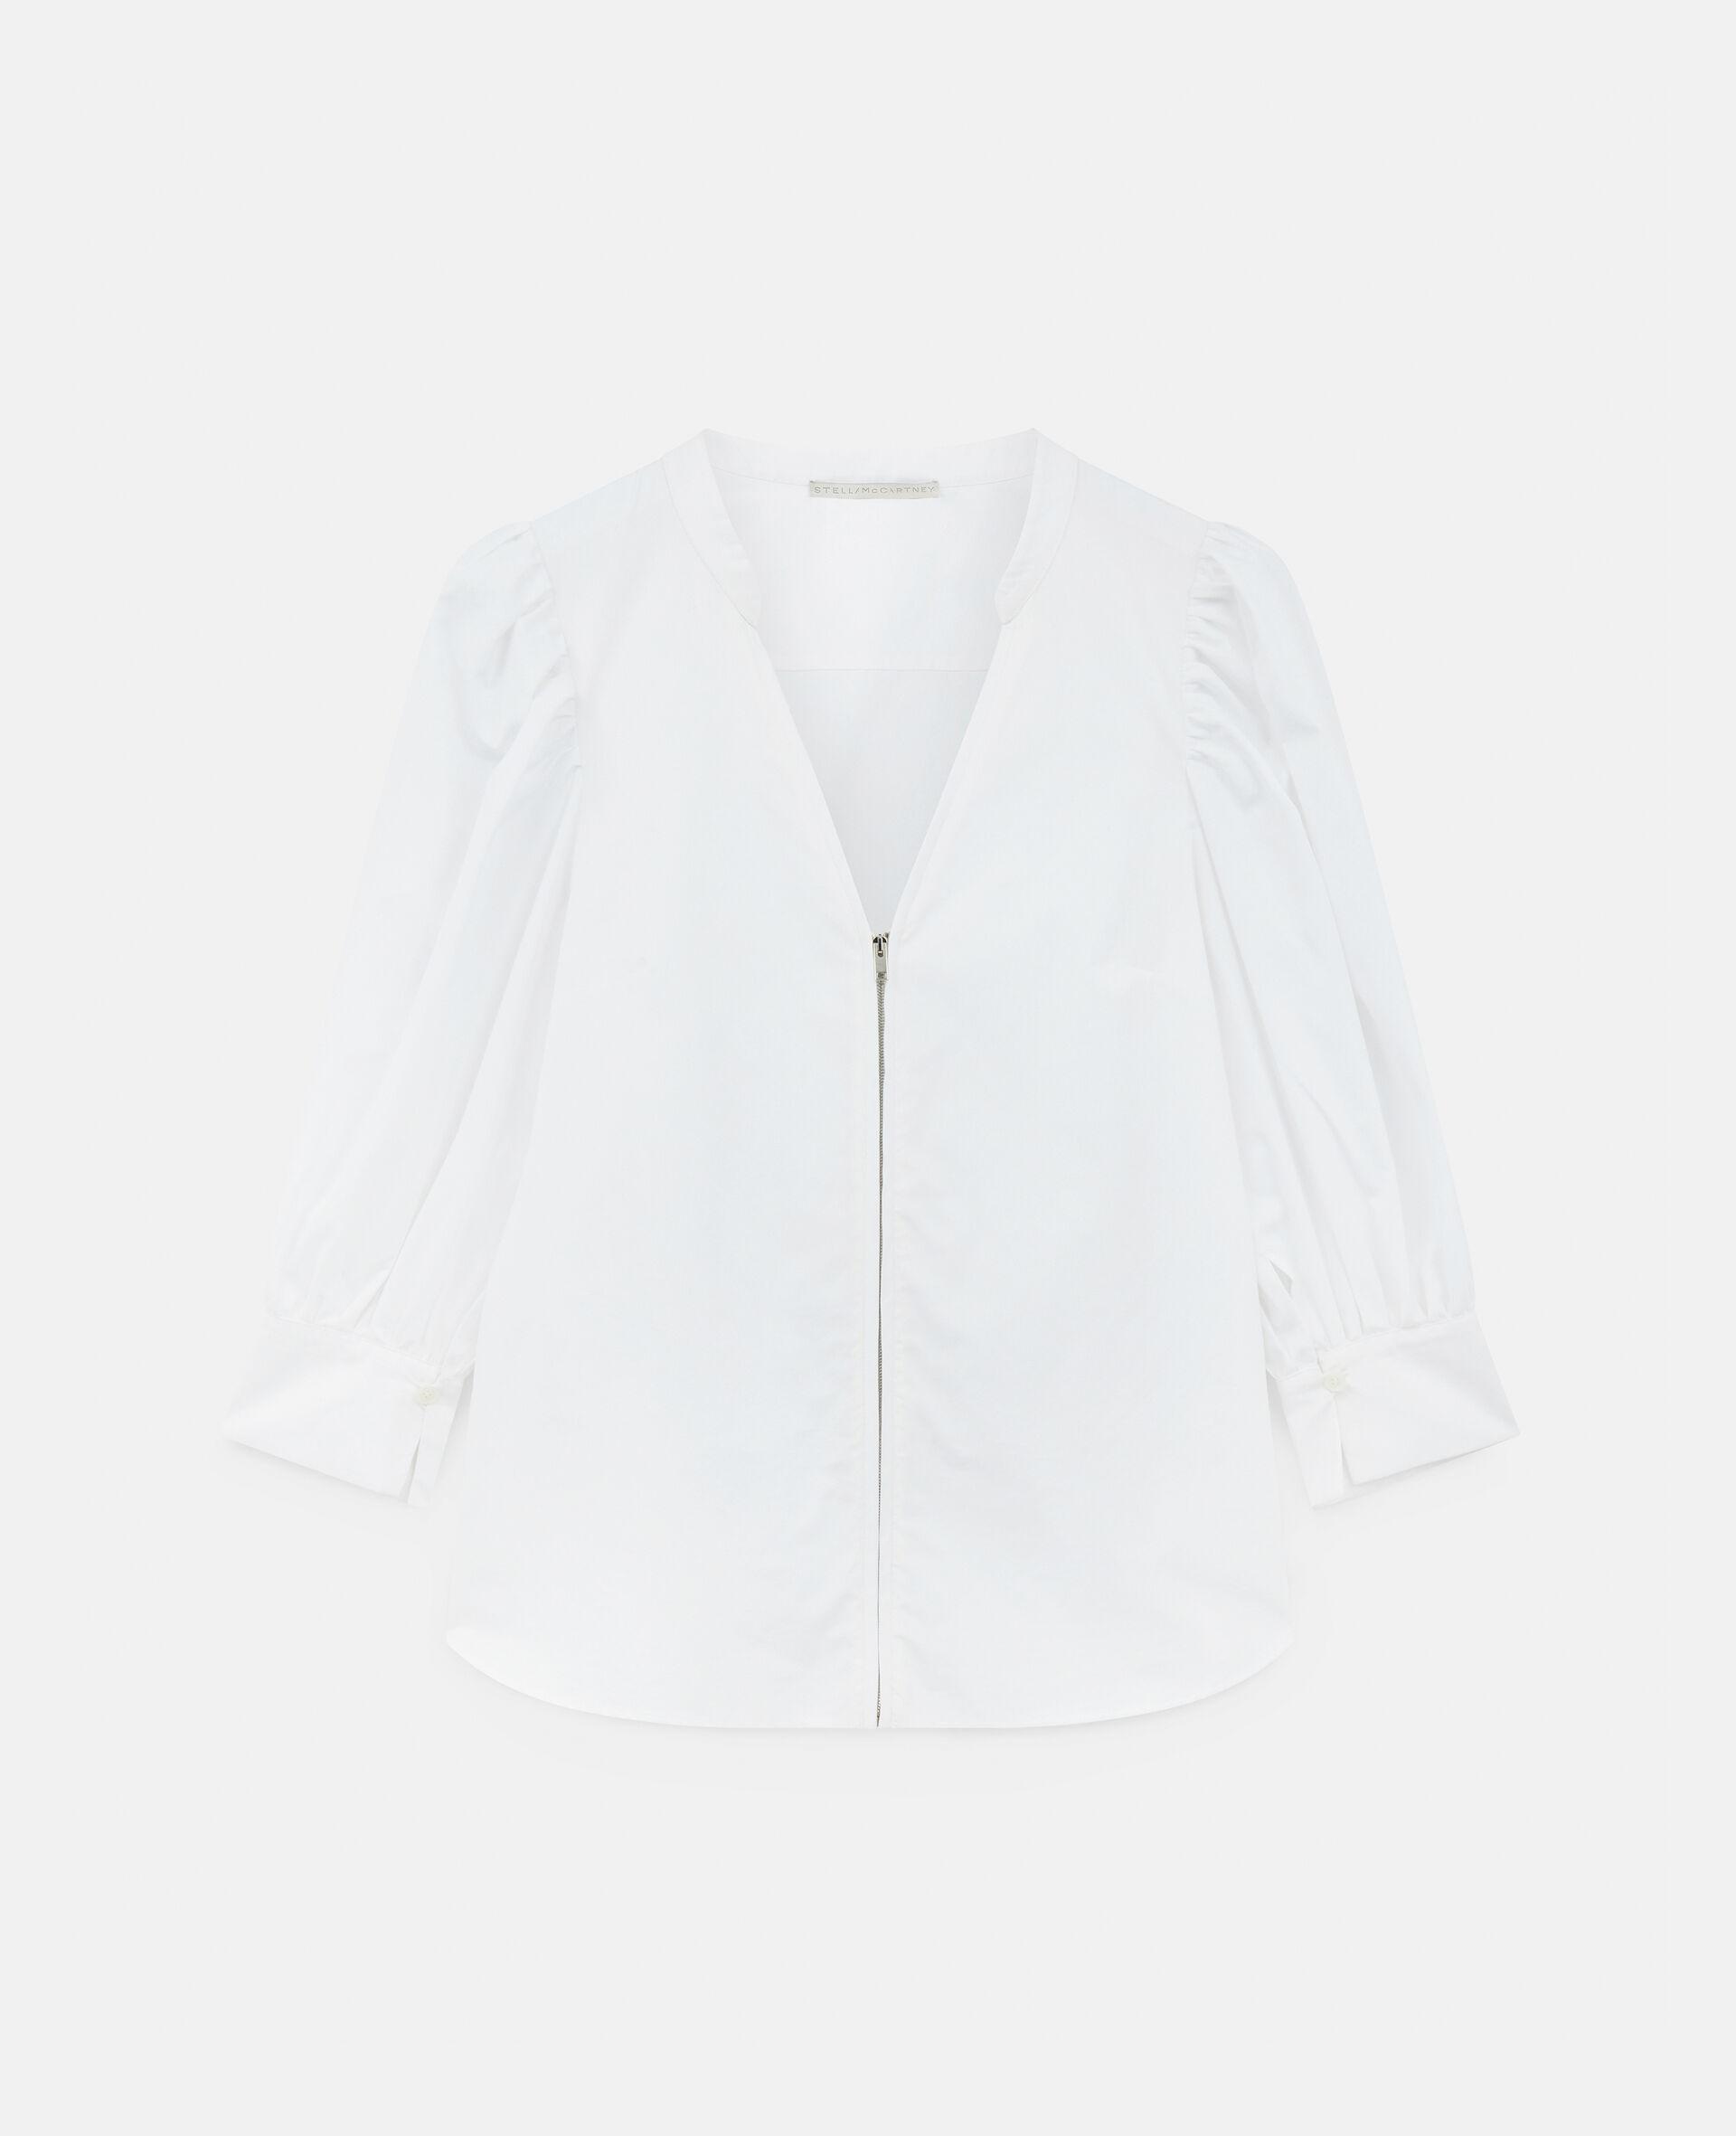 Rose Cotton Shirt-White-large image number 0